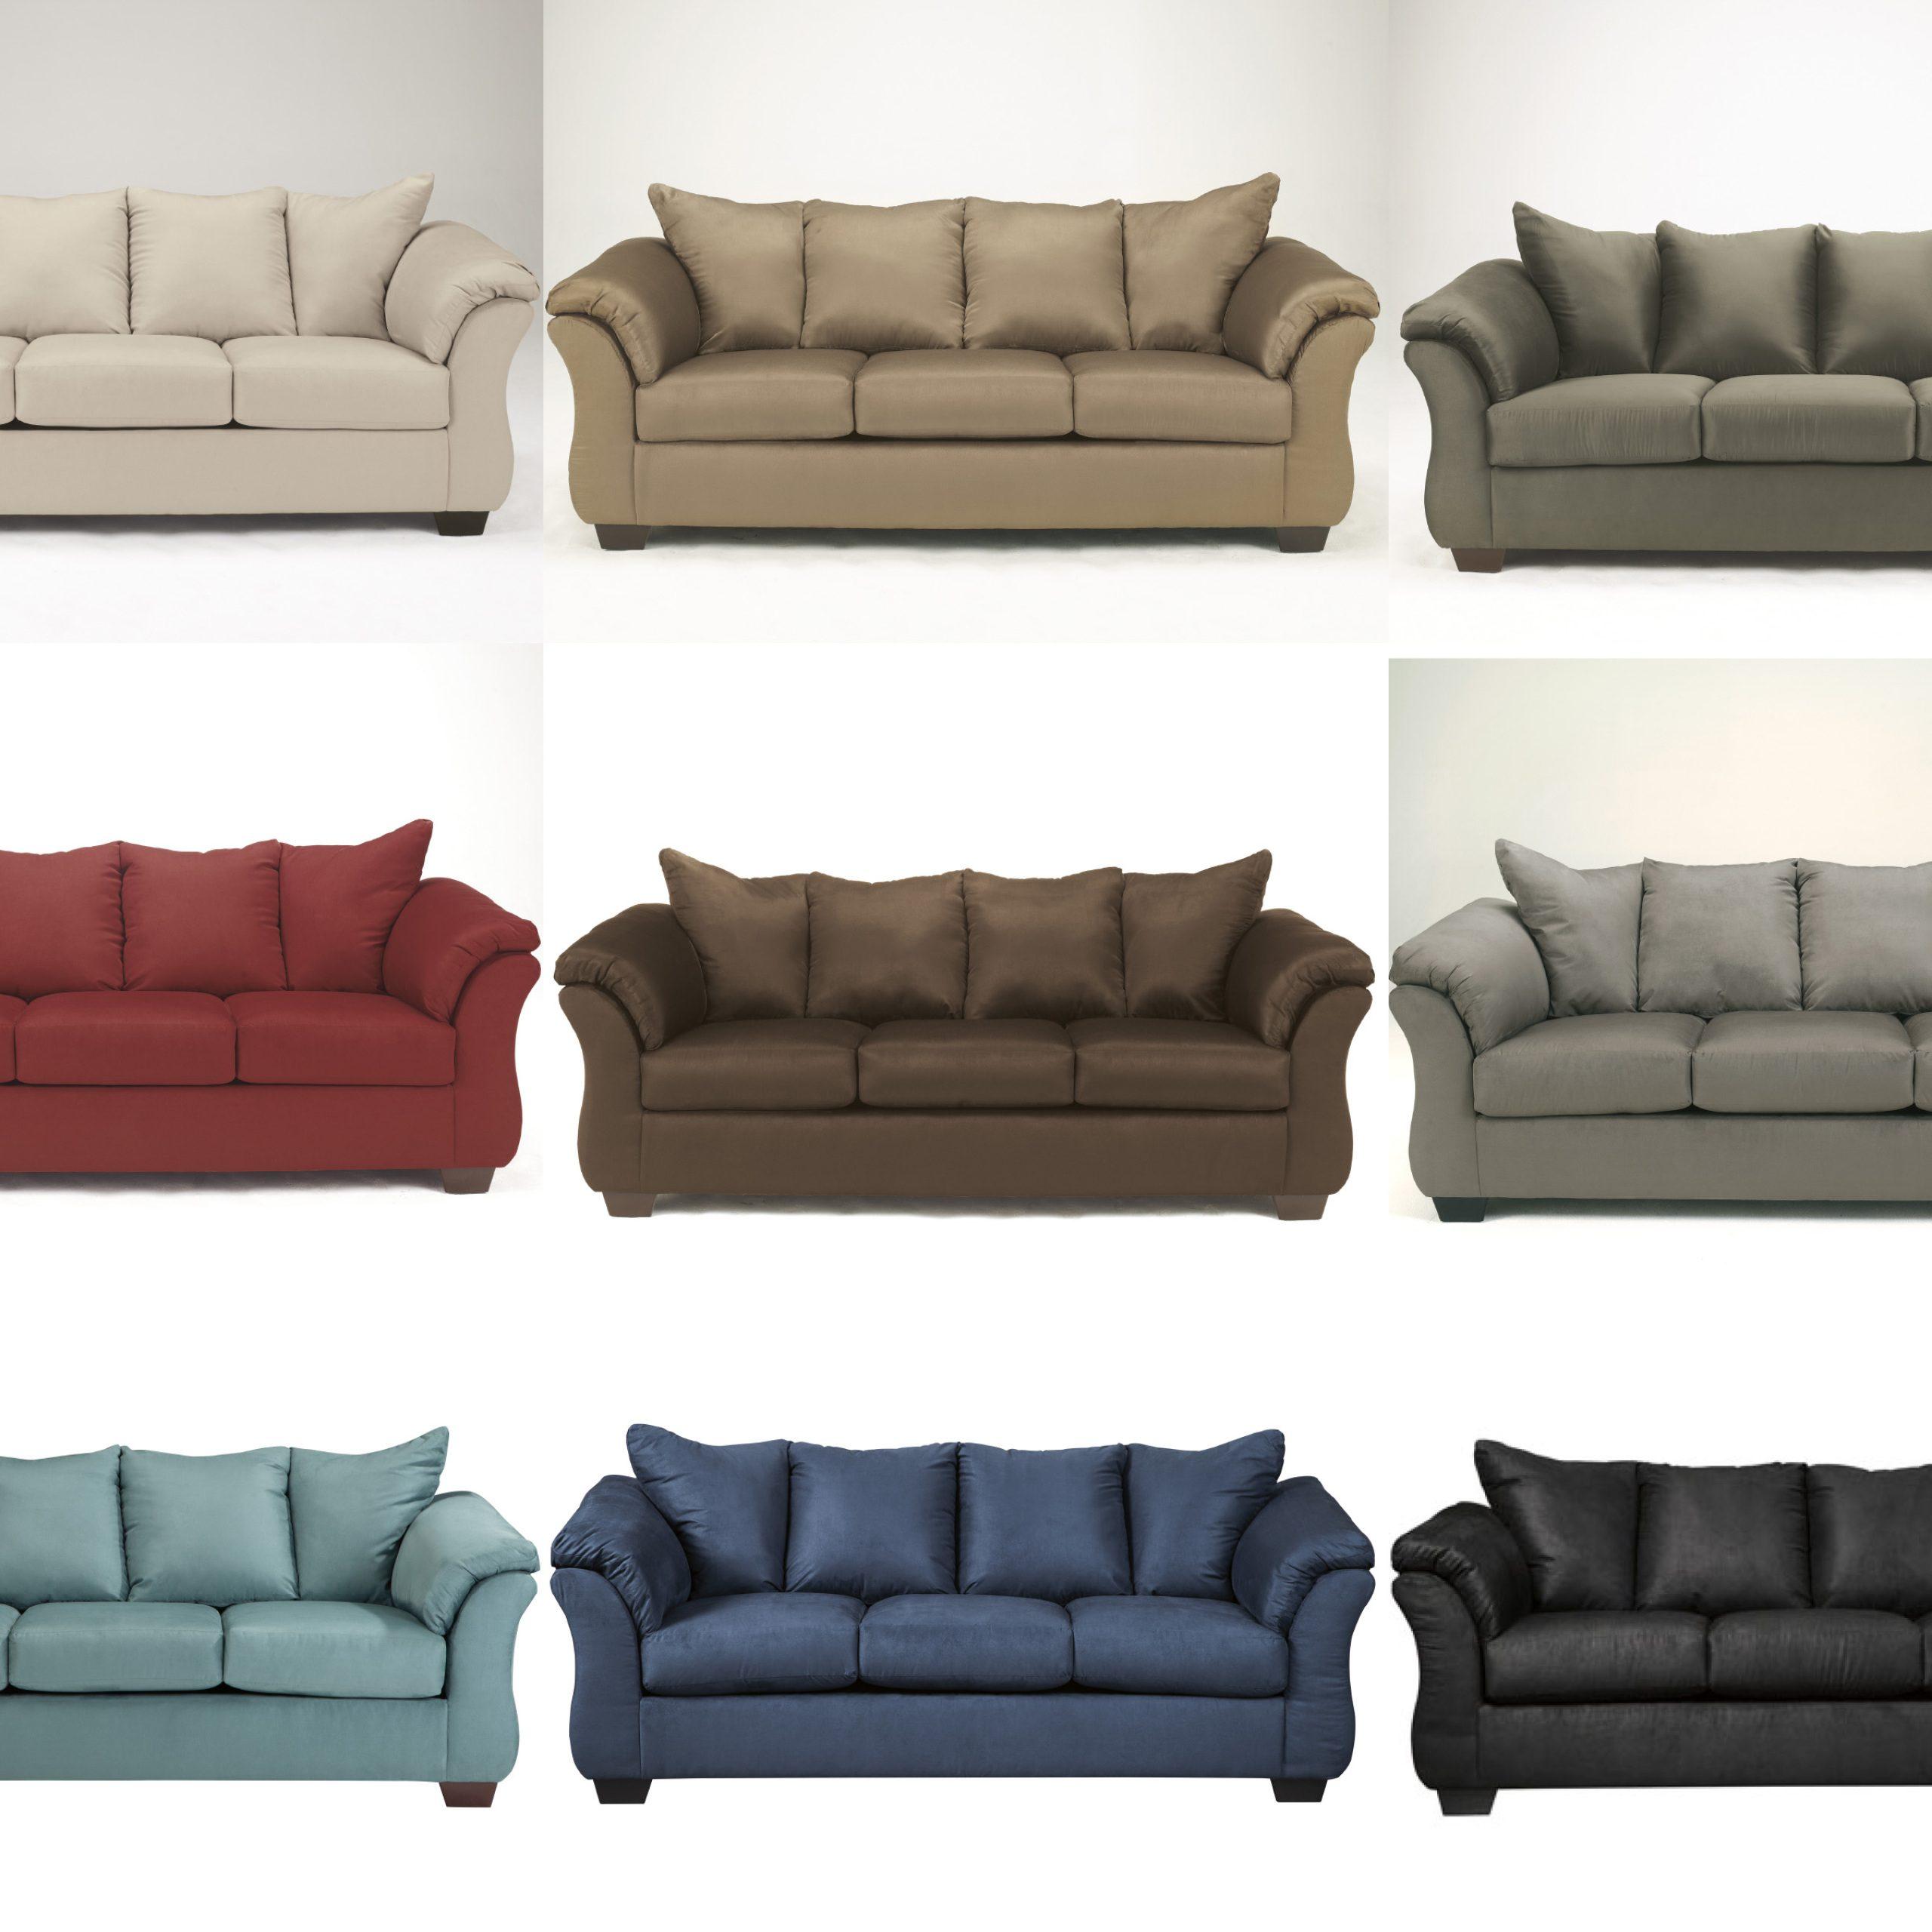 Ashley Signature Darcy Sleeper Sofa Regarding Felton Modern Style Pullout Sleeper Sofas Black (View 5 of 15)